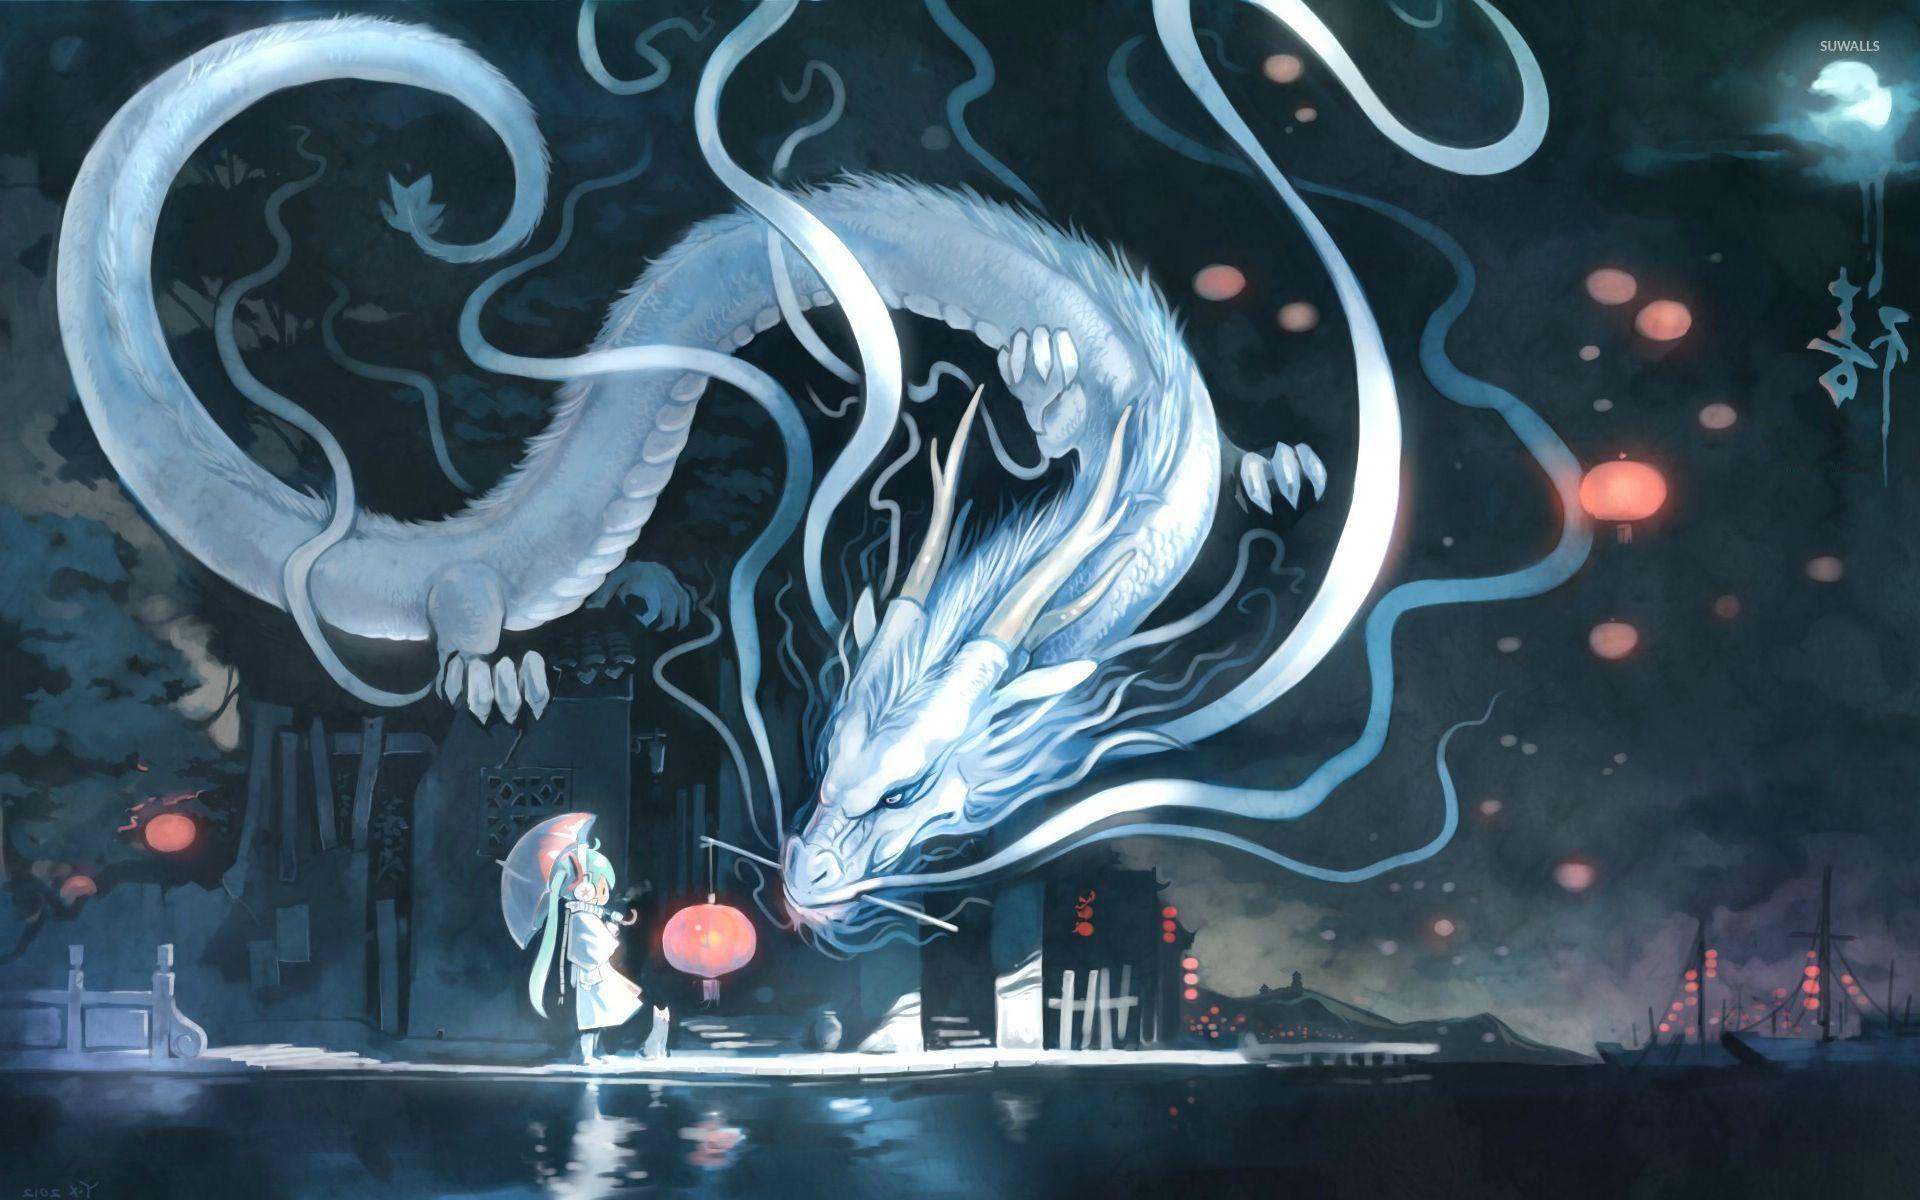 Hatsune Miku Facing A Dragon Wallpaper